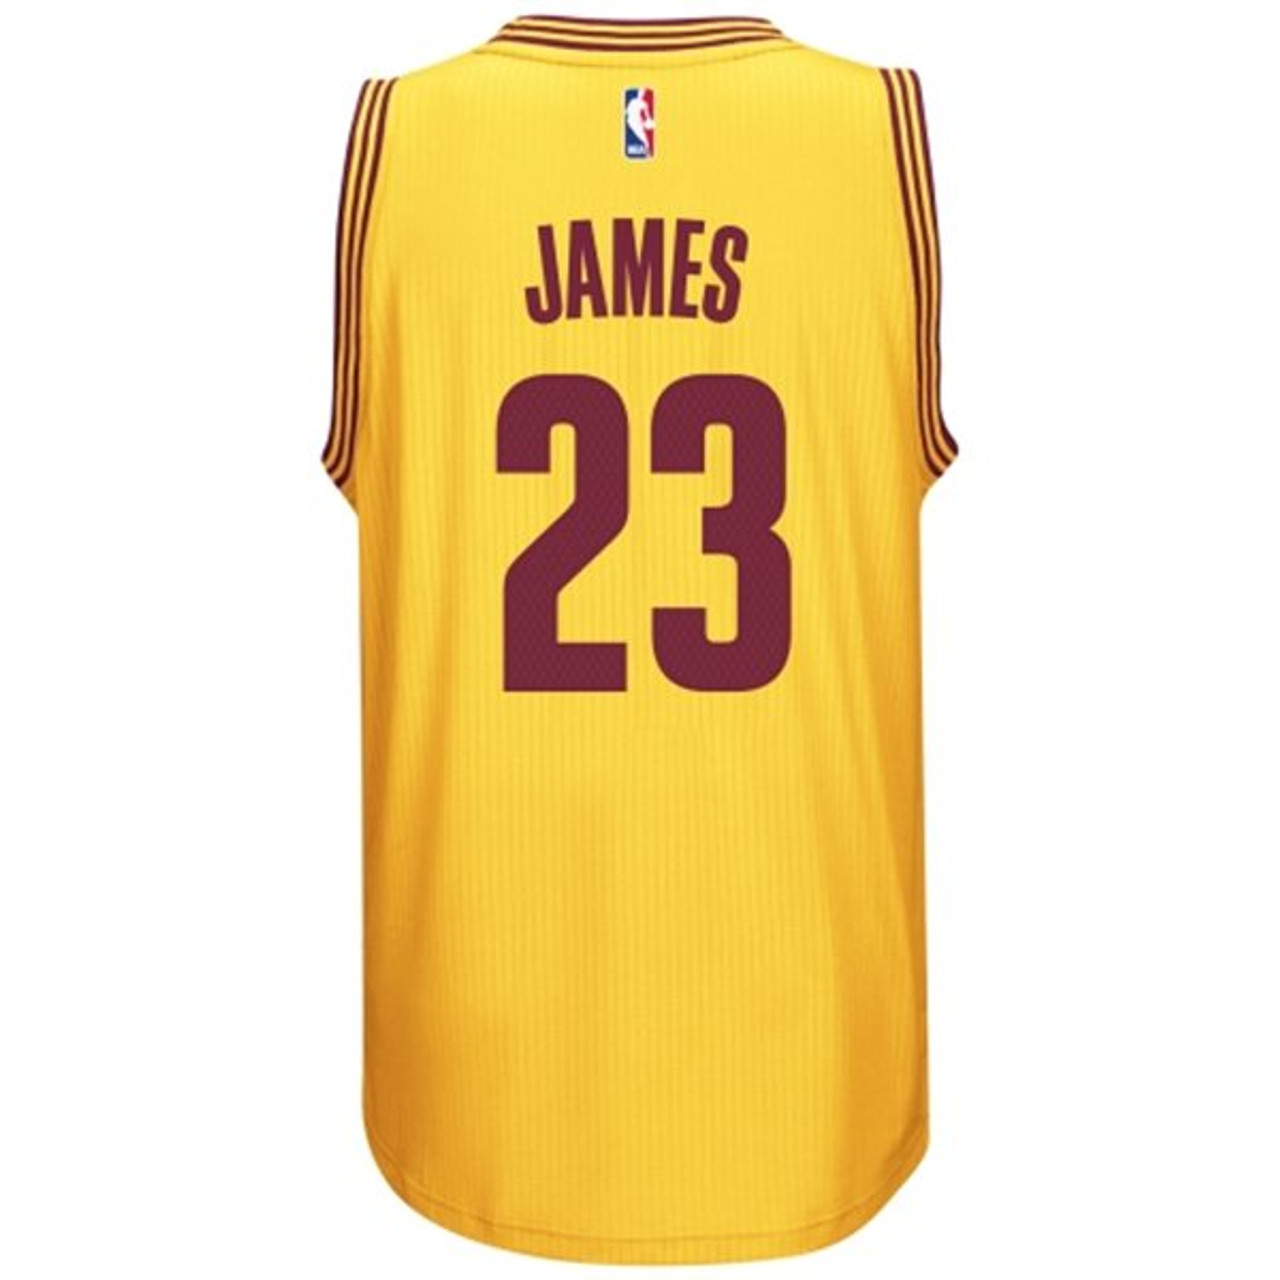 best website 9776d 4b273 Cleveland Cavaliers - LeBron James - Gold Alternate ...